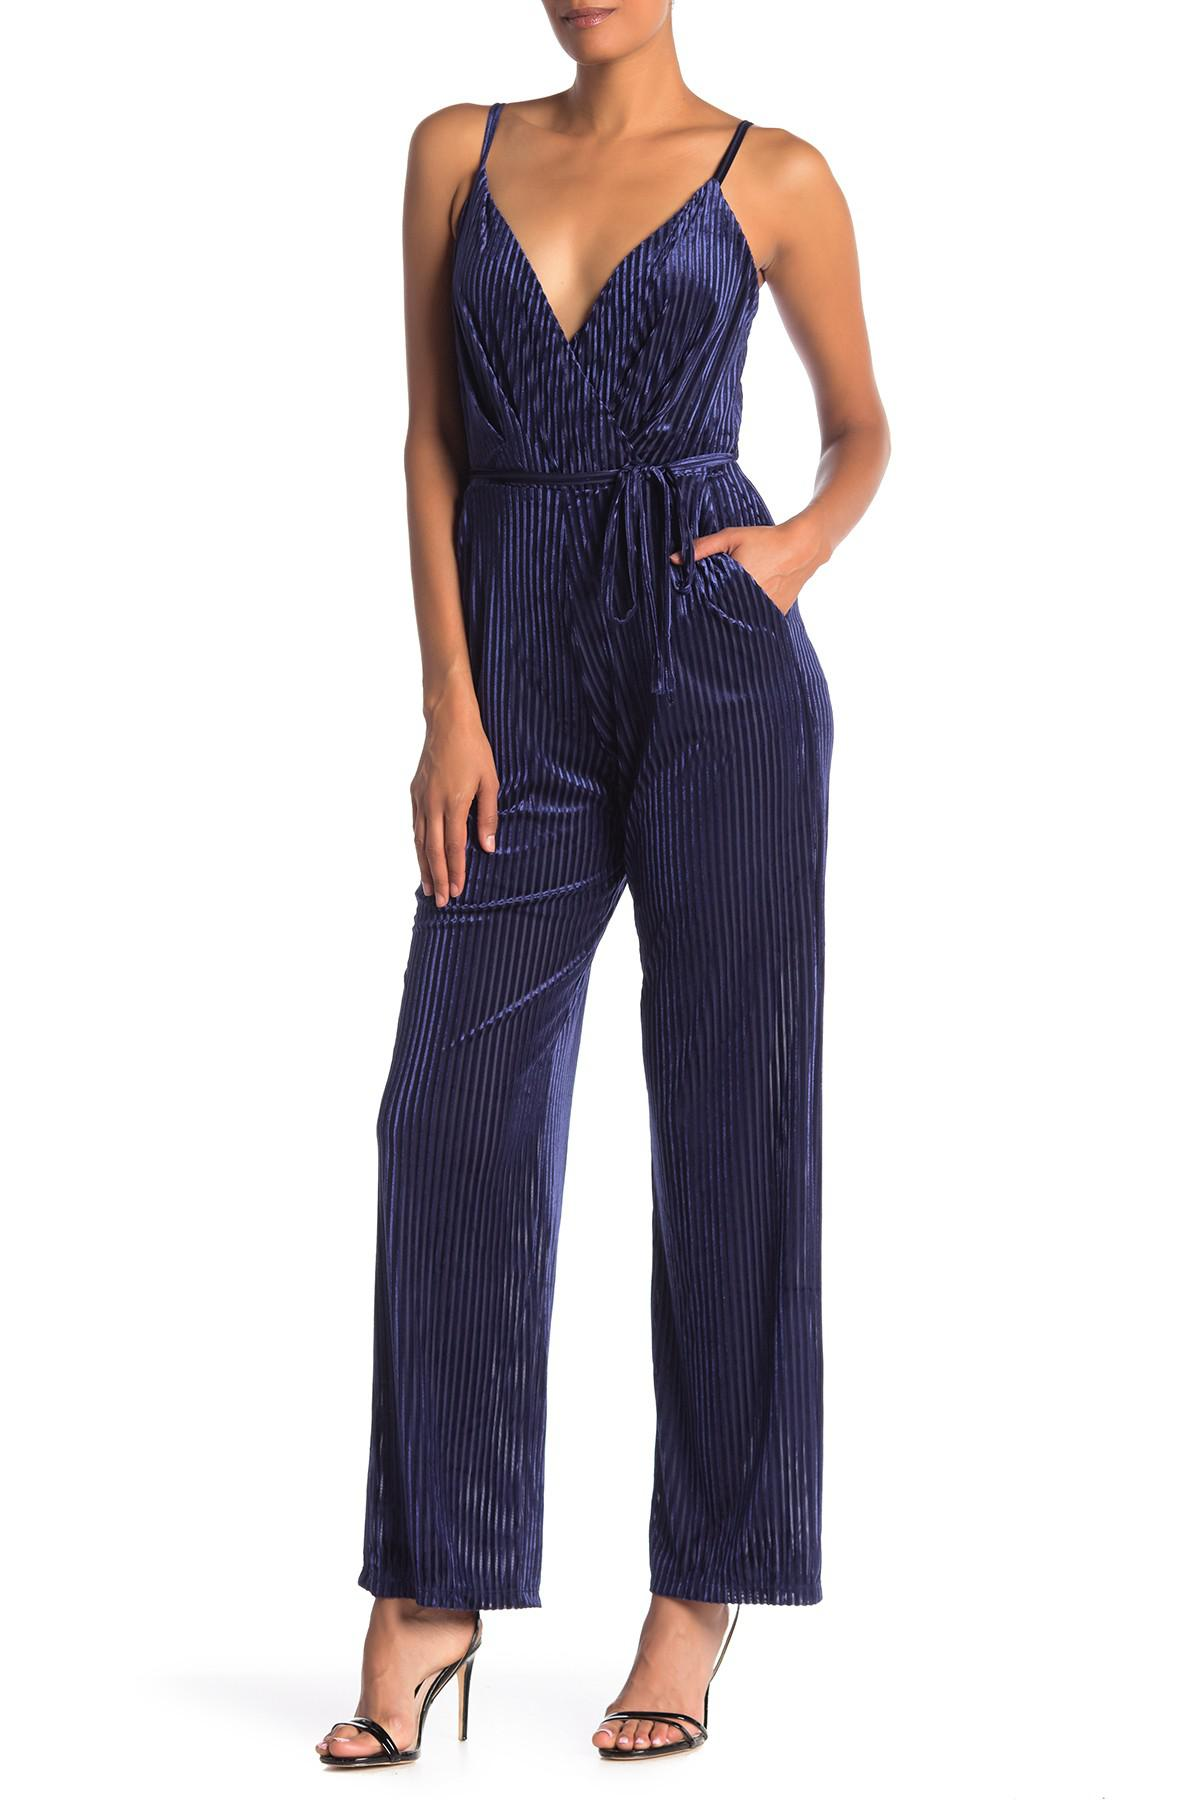 Laundry By Shelli Segal Ribbed Velvet Jumpsuit In Navy Blue Lyst